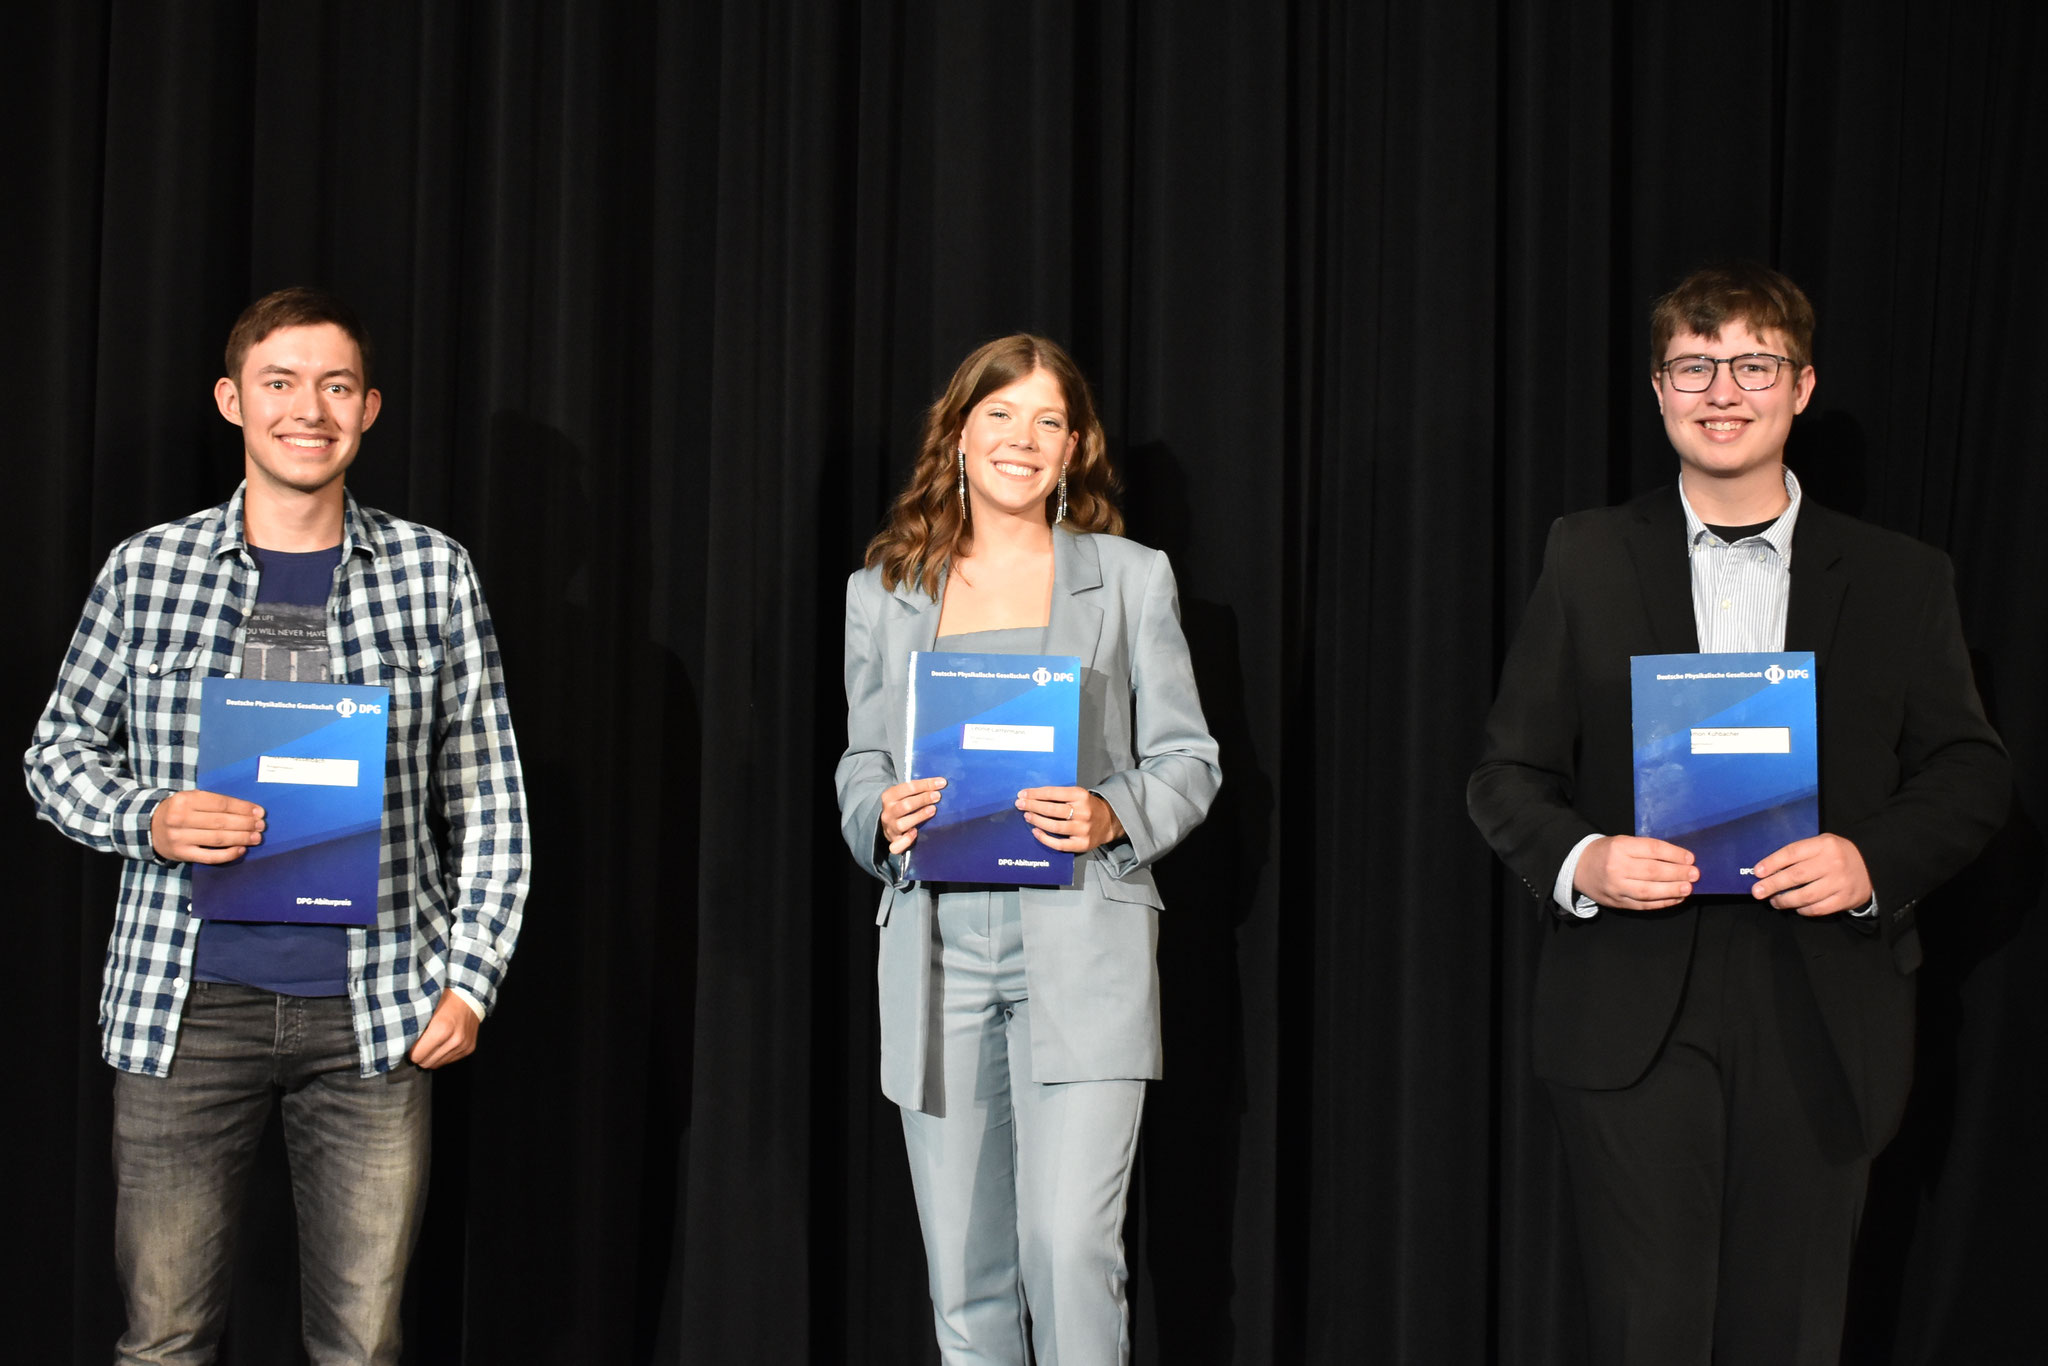 Abitur 2020 – v.l.: Maxim Hasselbach, Leonie Lantermann, Simon Kühbacher alle LK.